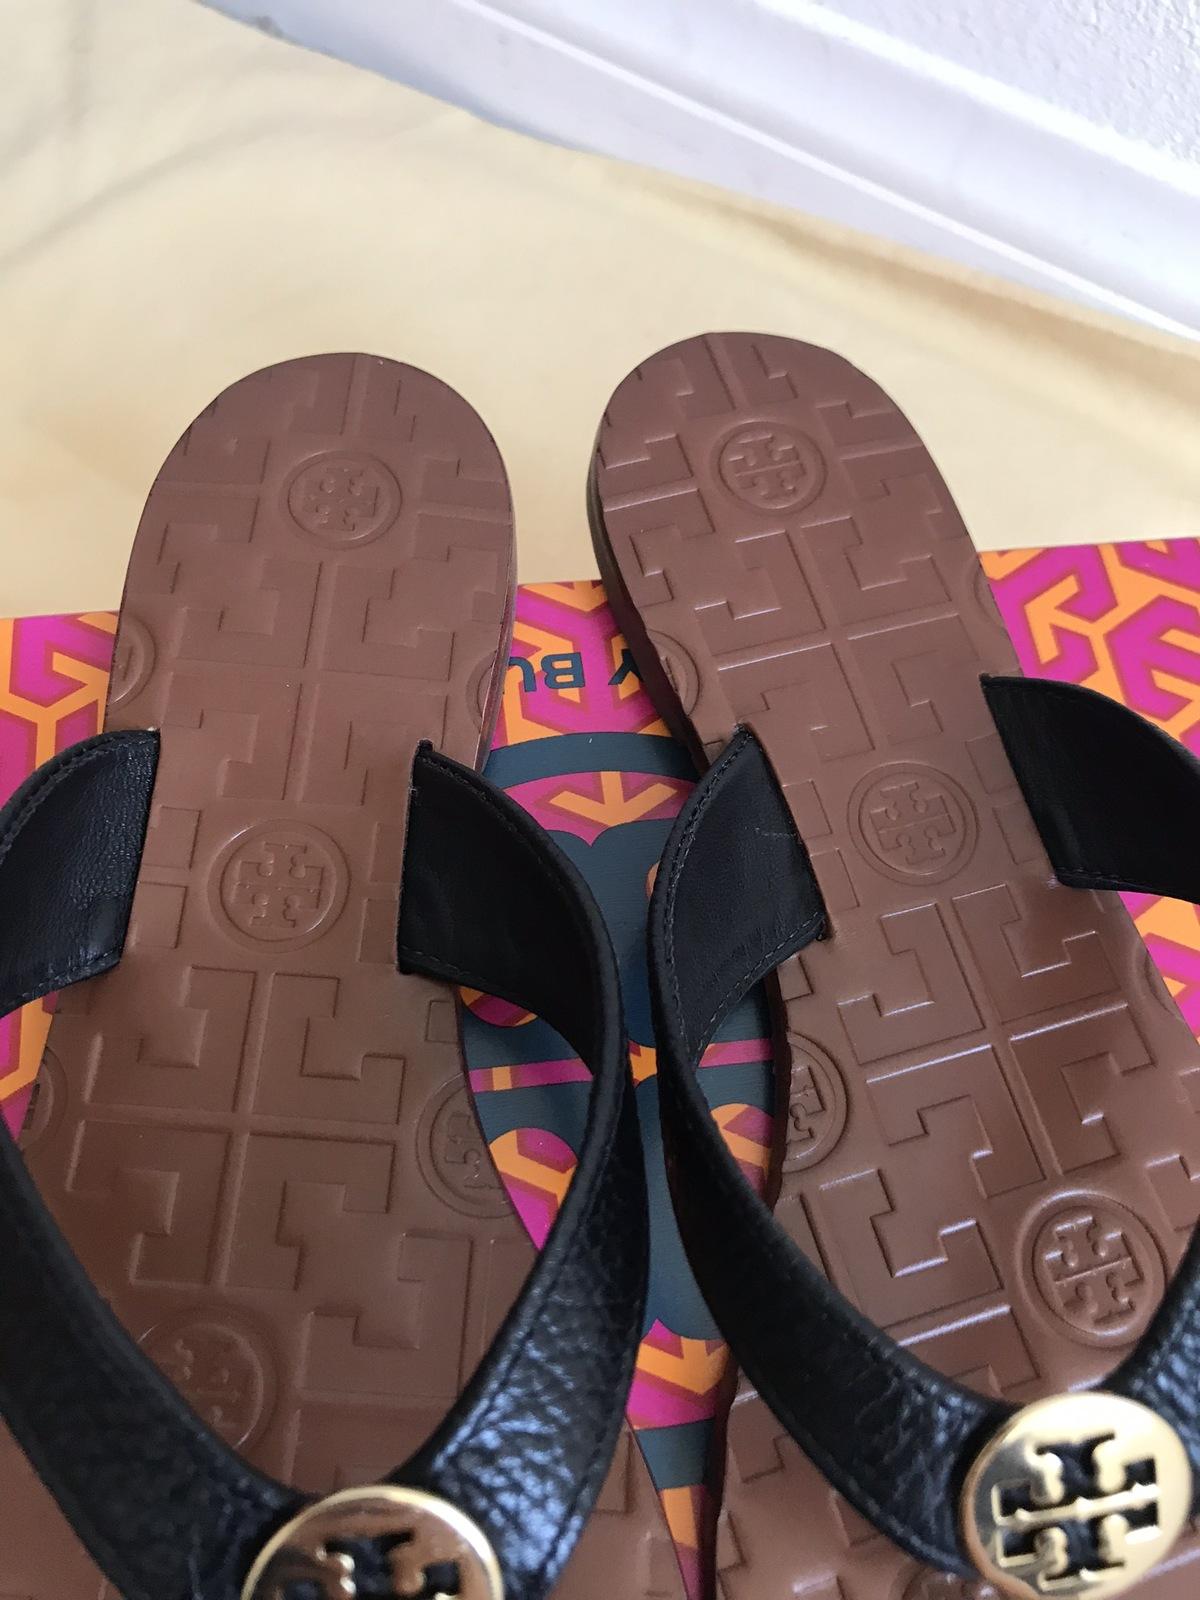 d77422062 size 7M NIB TORY BURCH Black/ Gold Thora Thong Leather Sandals